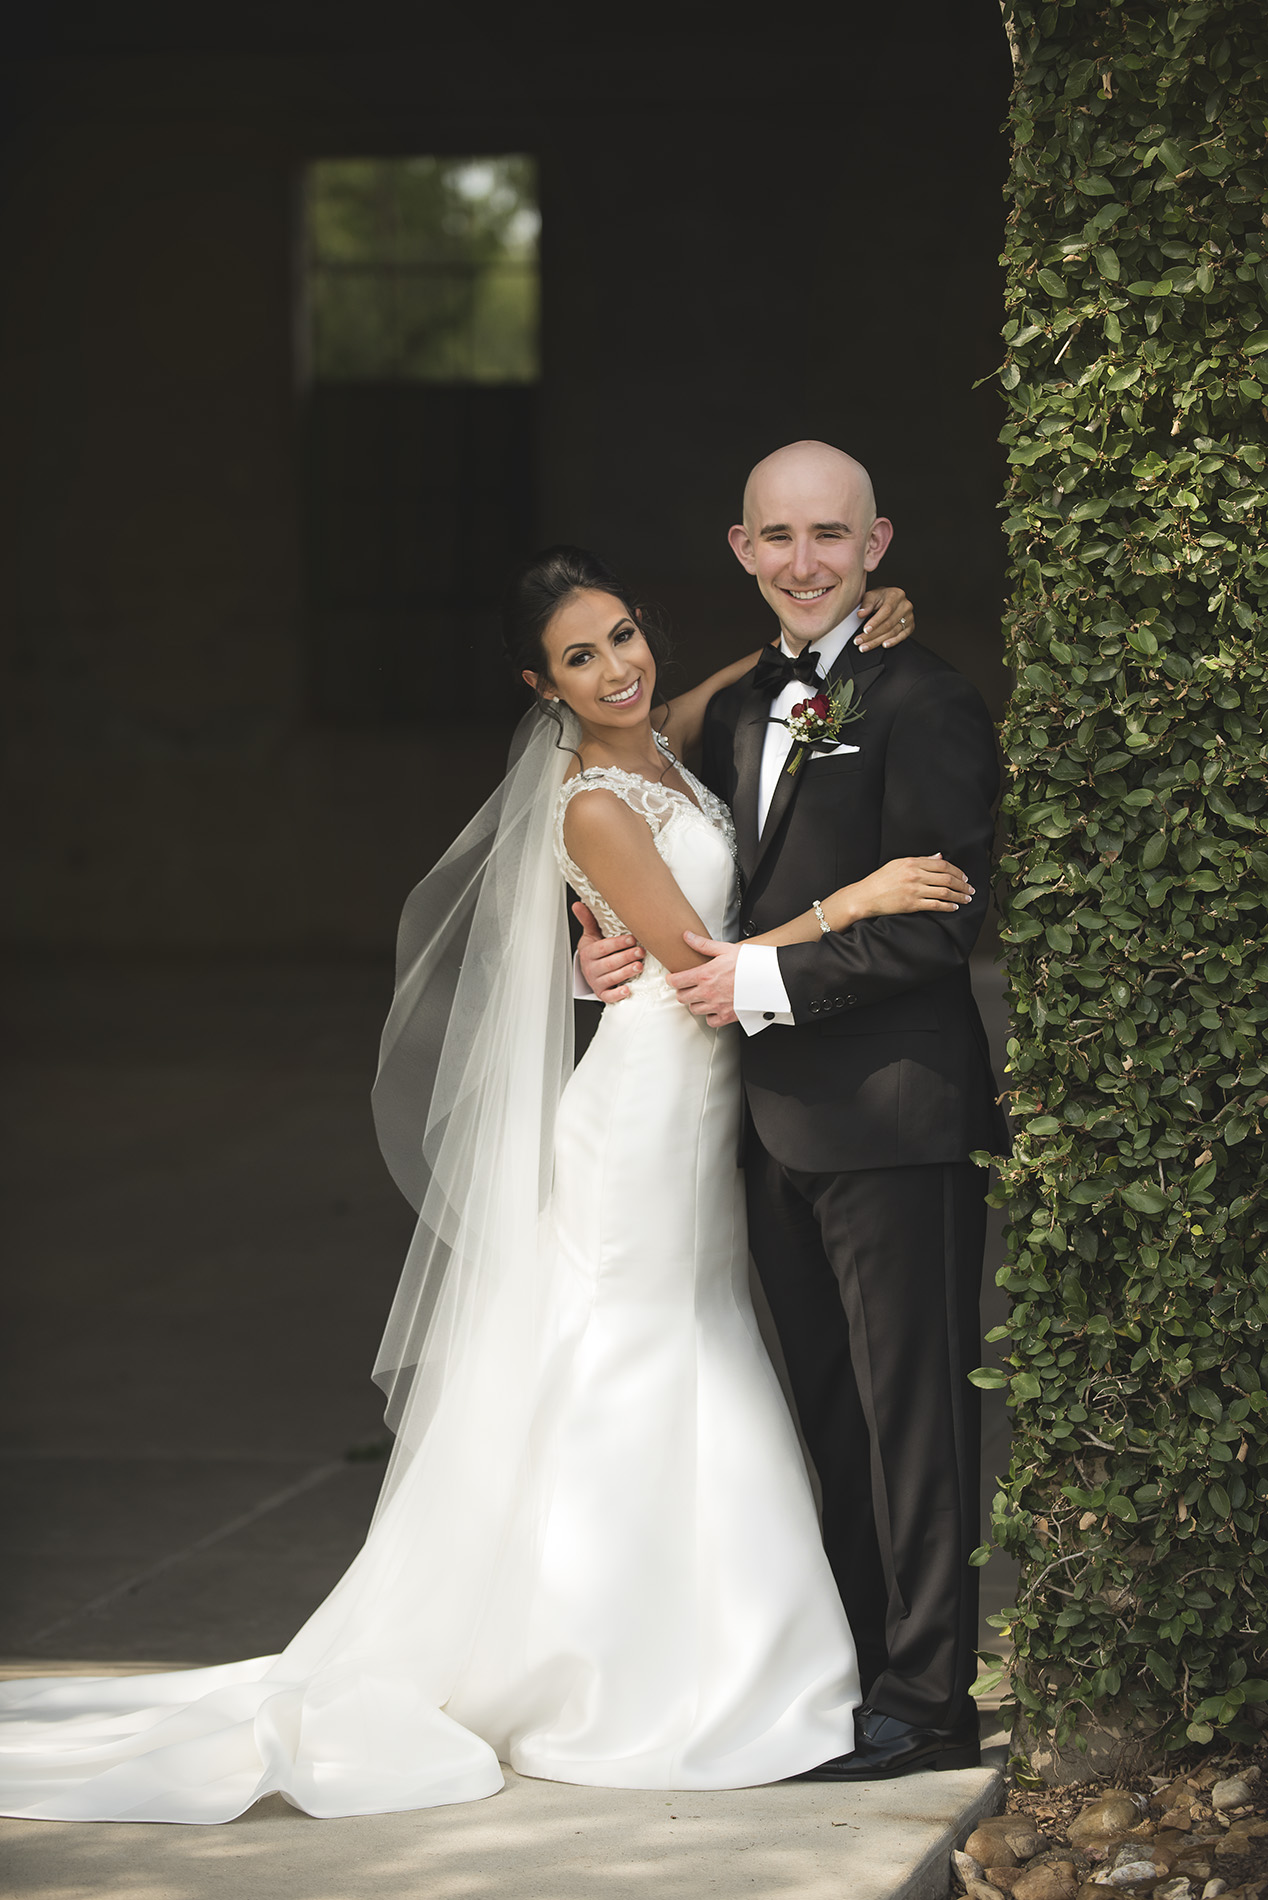 Houston-venue-Olde-Dobbin-Station-Romantic-Classic-Wedding-Photographer-033.jpg